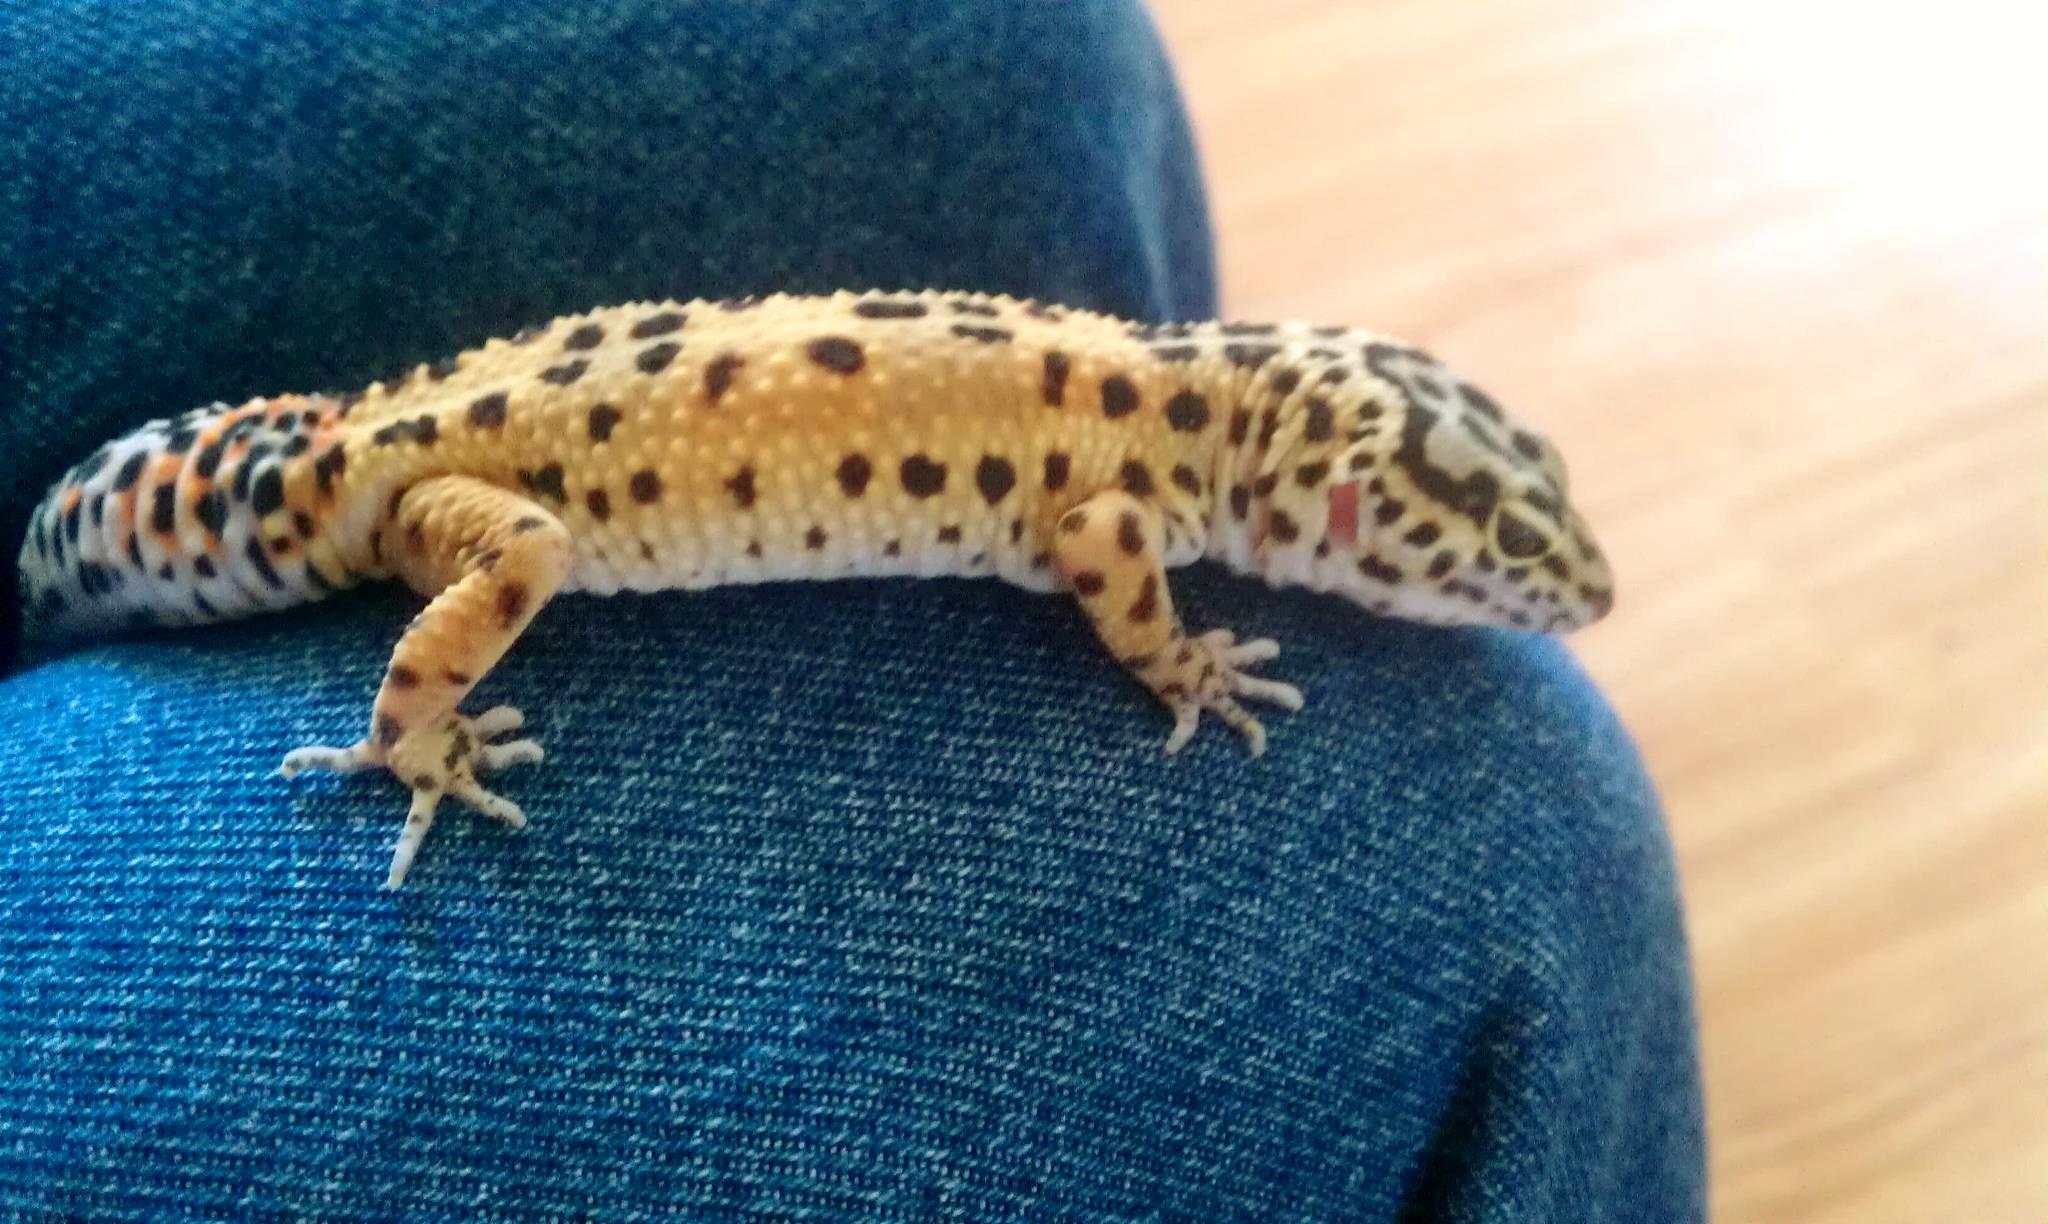 Cute Leopard Gecko Wallpaper Lizards Images My Leopard Gecko Hd Wallpaper And